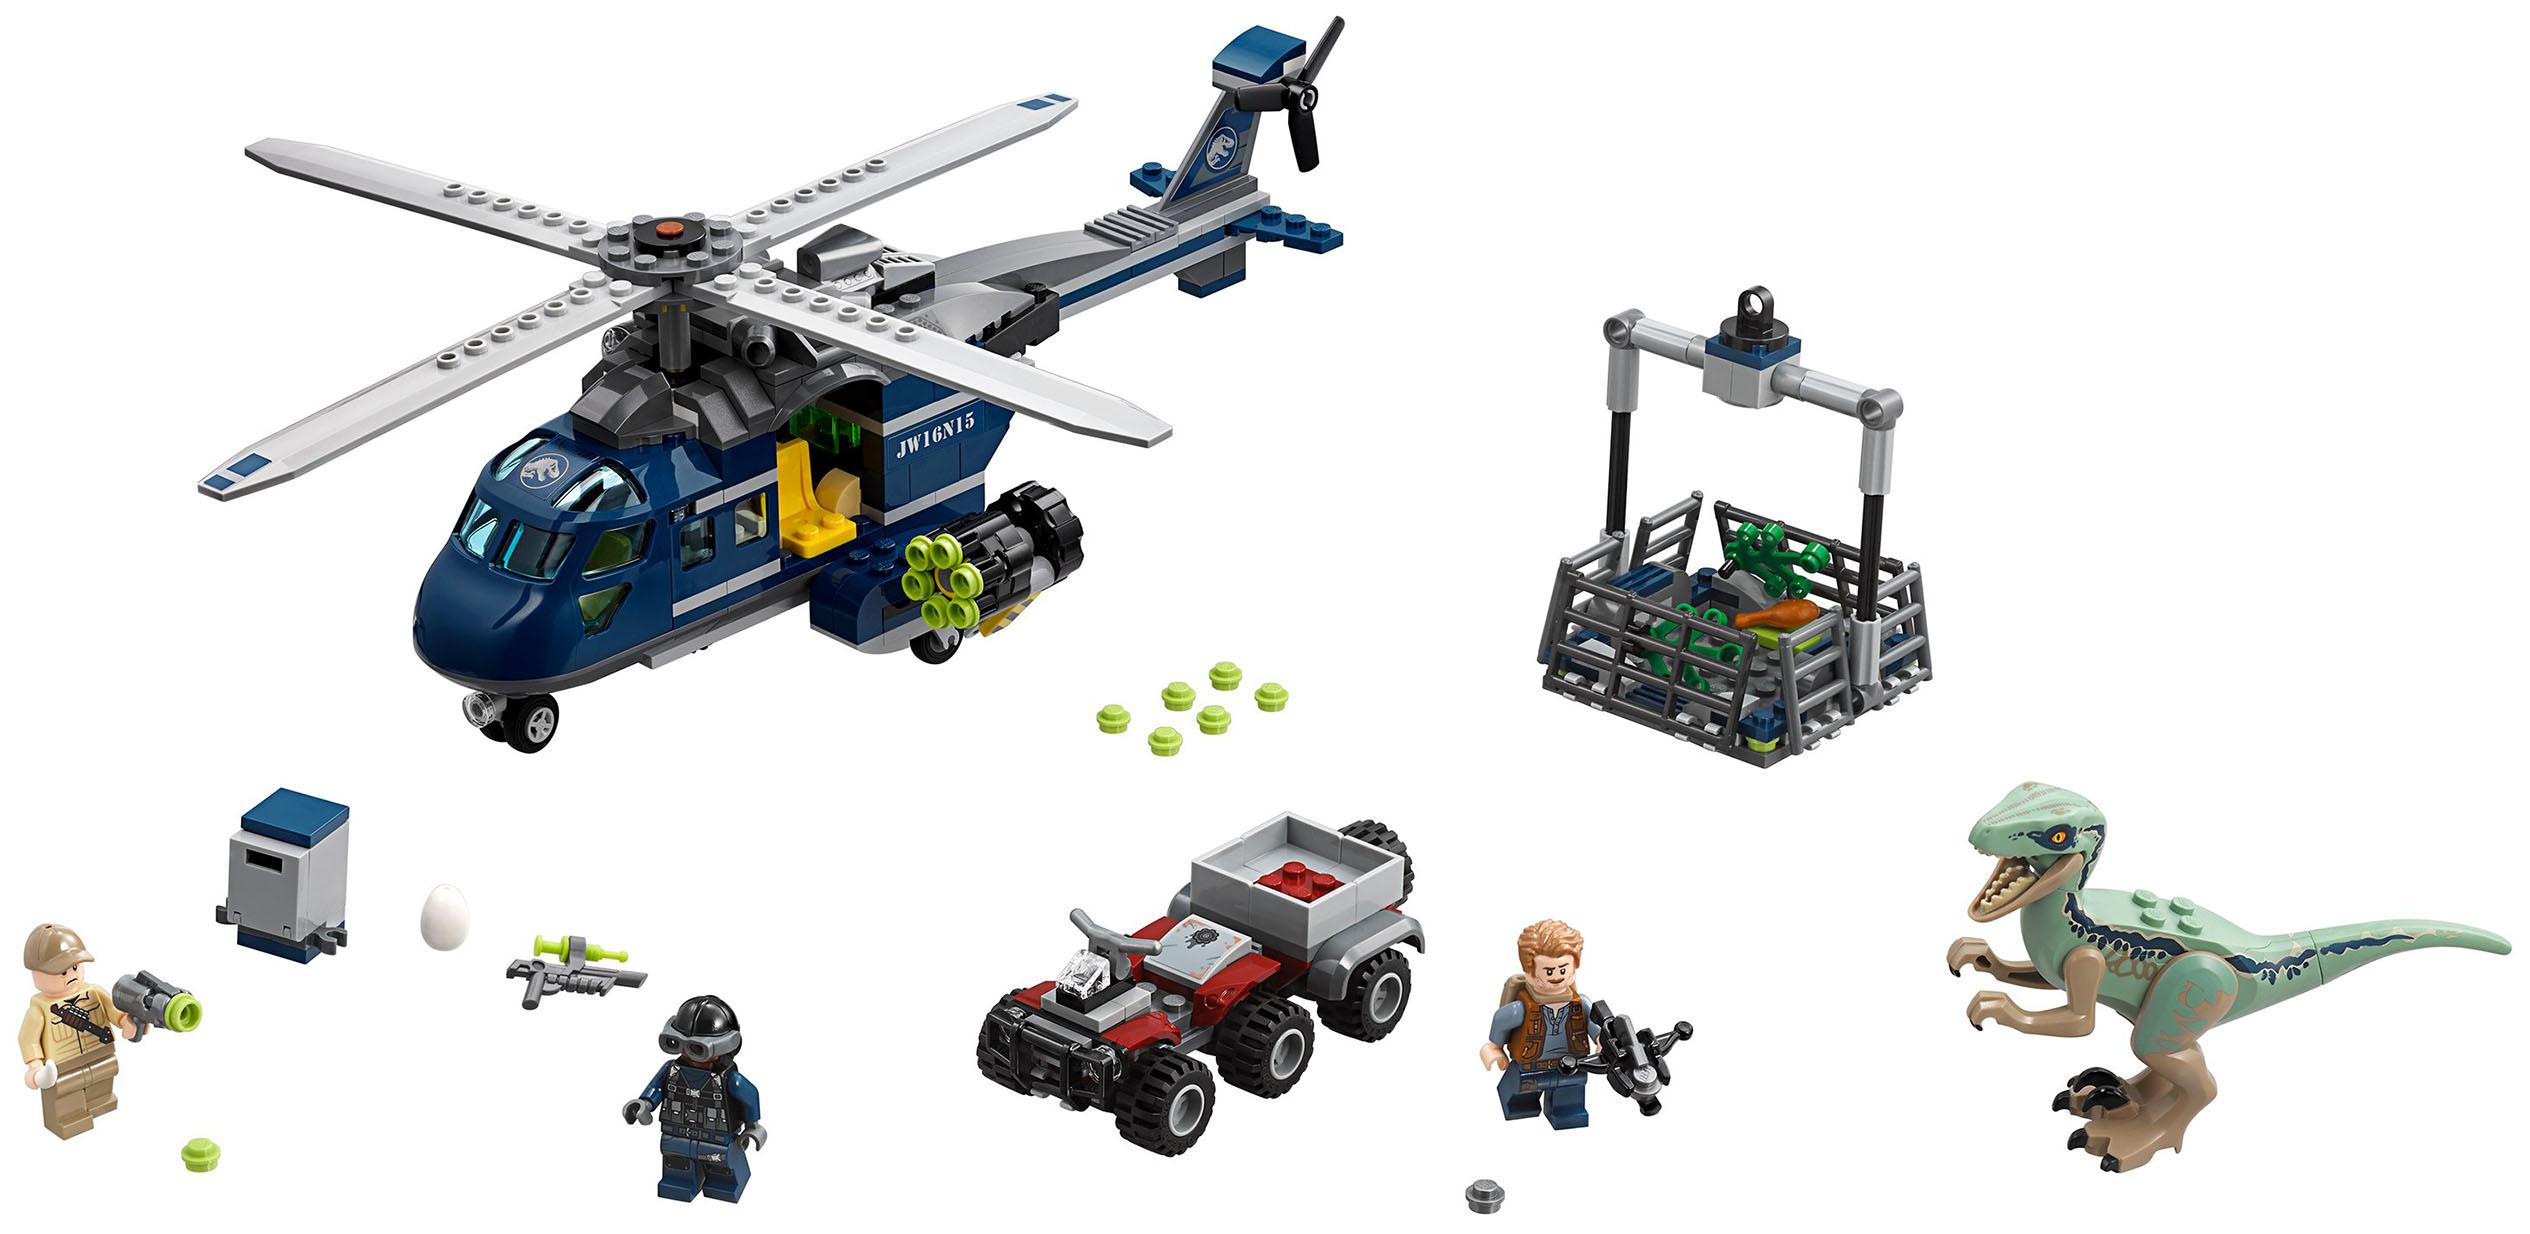 Купить Конструктор lego jurassic world погоня за блю на вертолете 75928, Конструктор LEGO Jurassic World Погоня за Блю на вертолете 75928